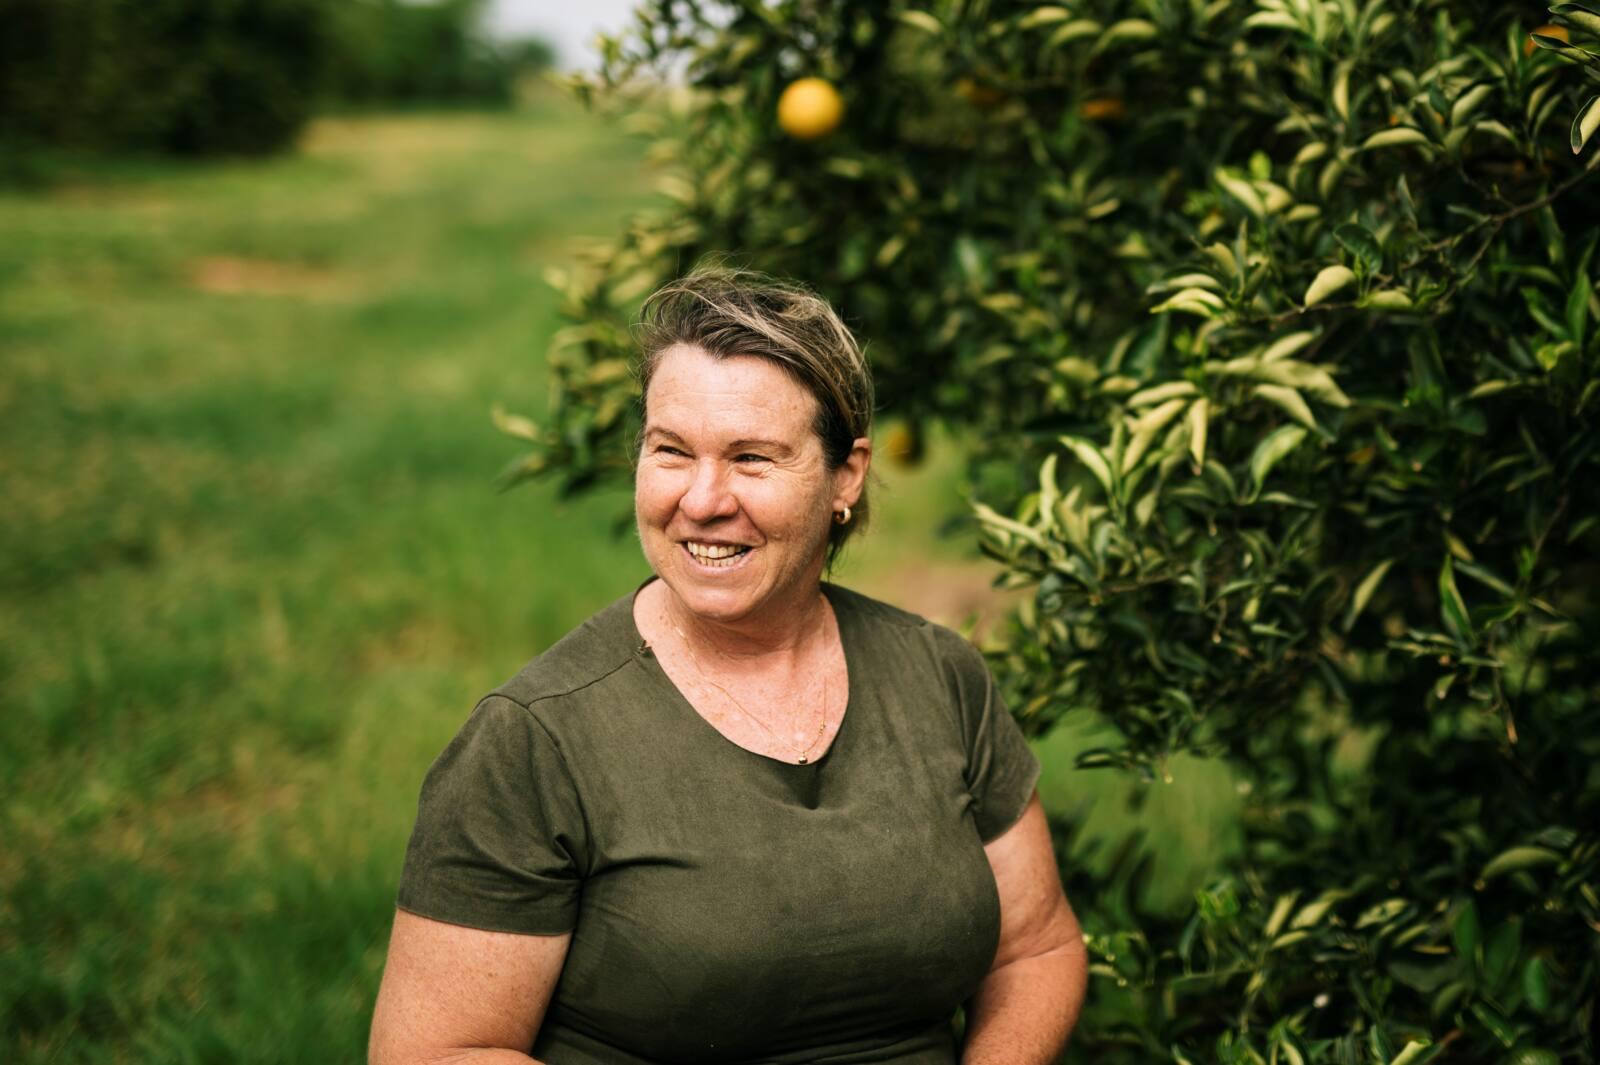 #Storybox: Brasilianische Orangen von Sueli Aparecida Silva